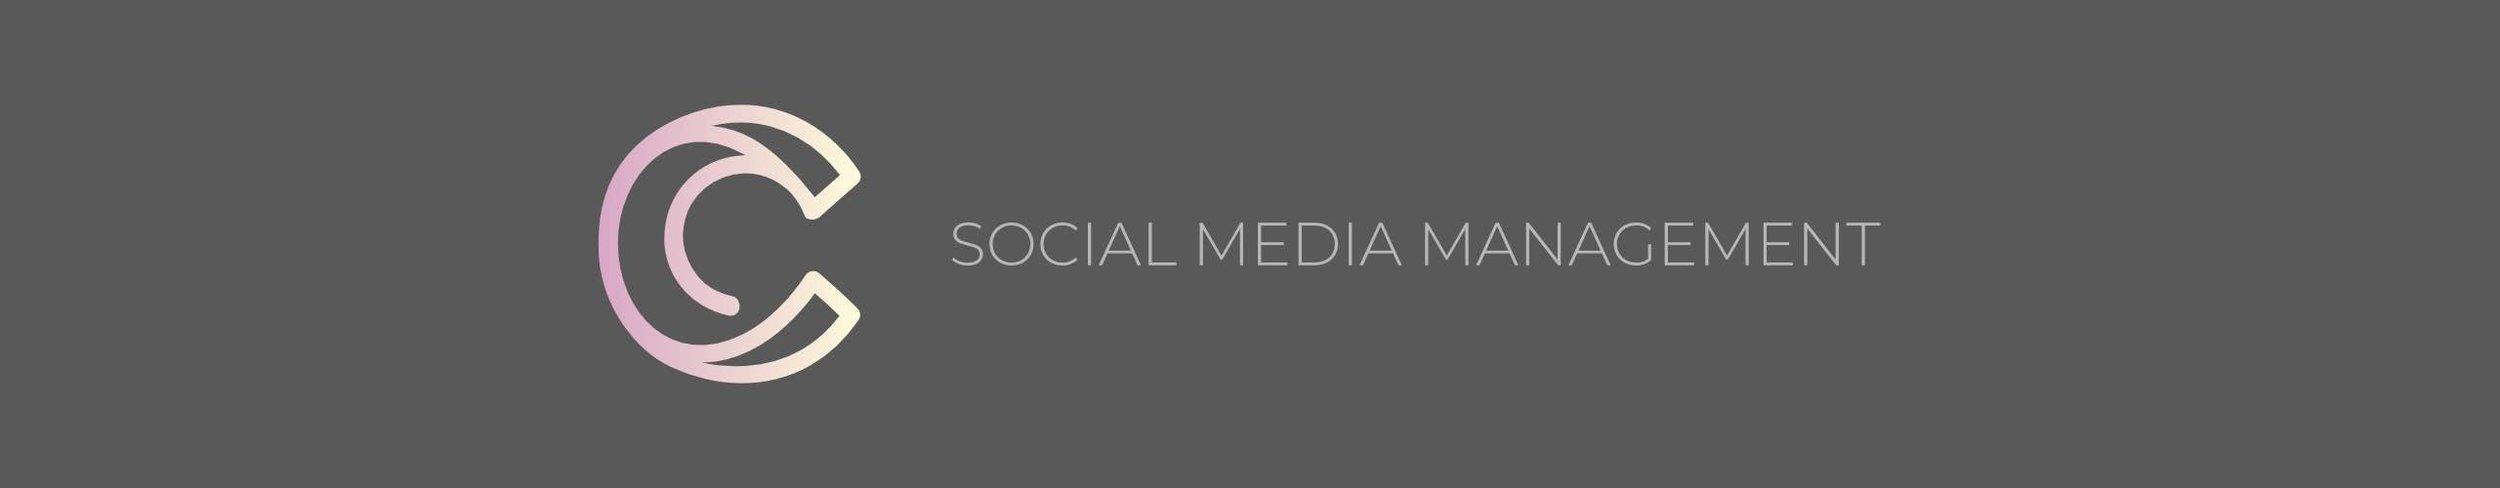 the-creative-co-social-media-banner.jpg